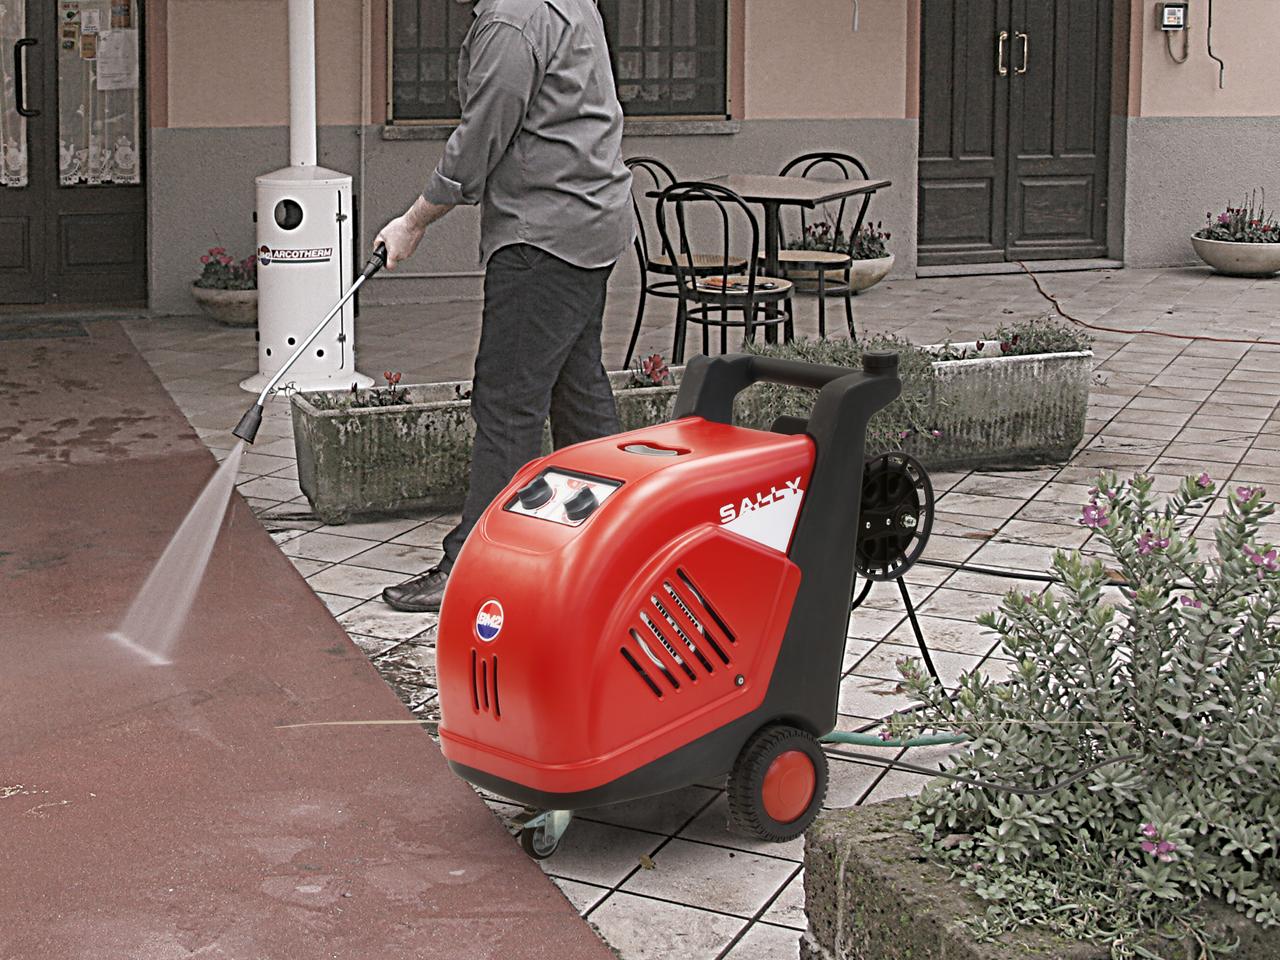 IDROPULITRICI AD ACQUA CALDA HOT WATER HIGH PRESSURE CLEANERS 2.jpg